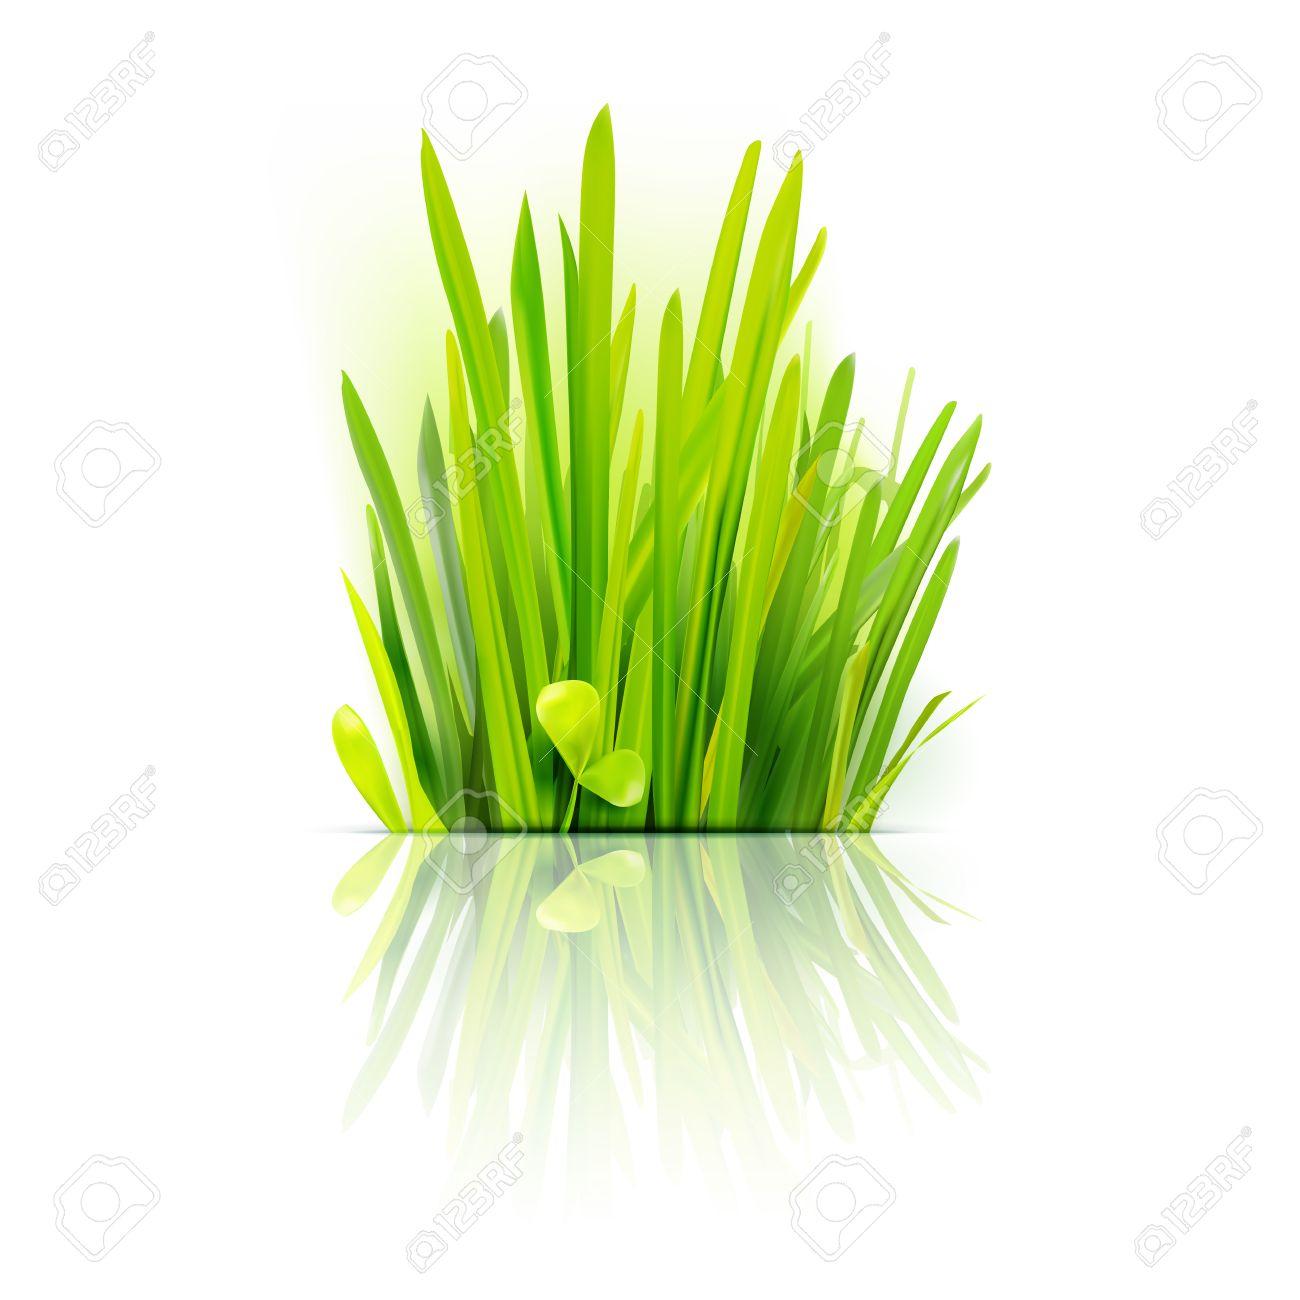 Realistic grass design element. Eco friendly field illustration. Summer green . Growth flora emblem. - 43041723